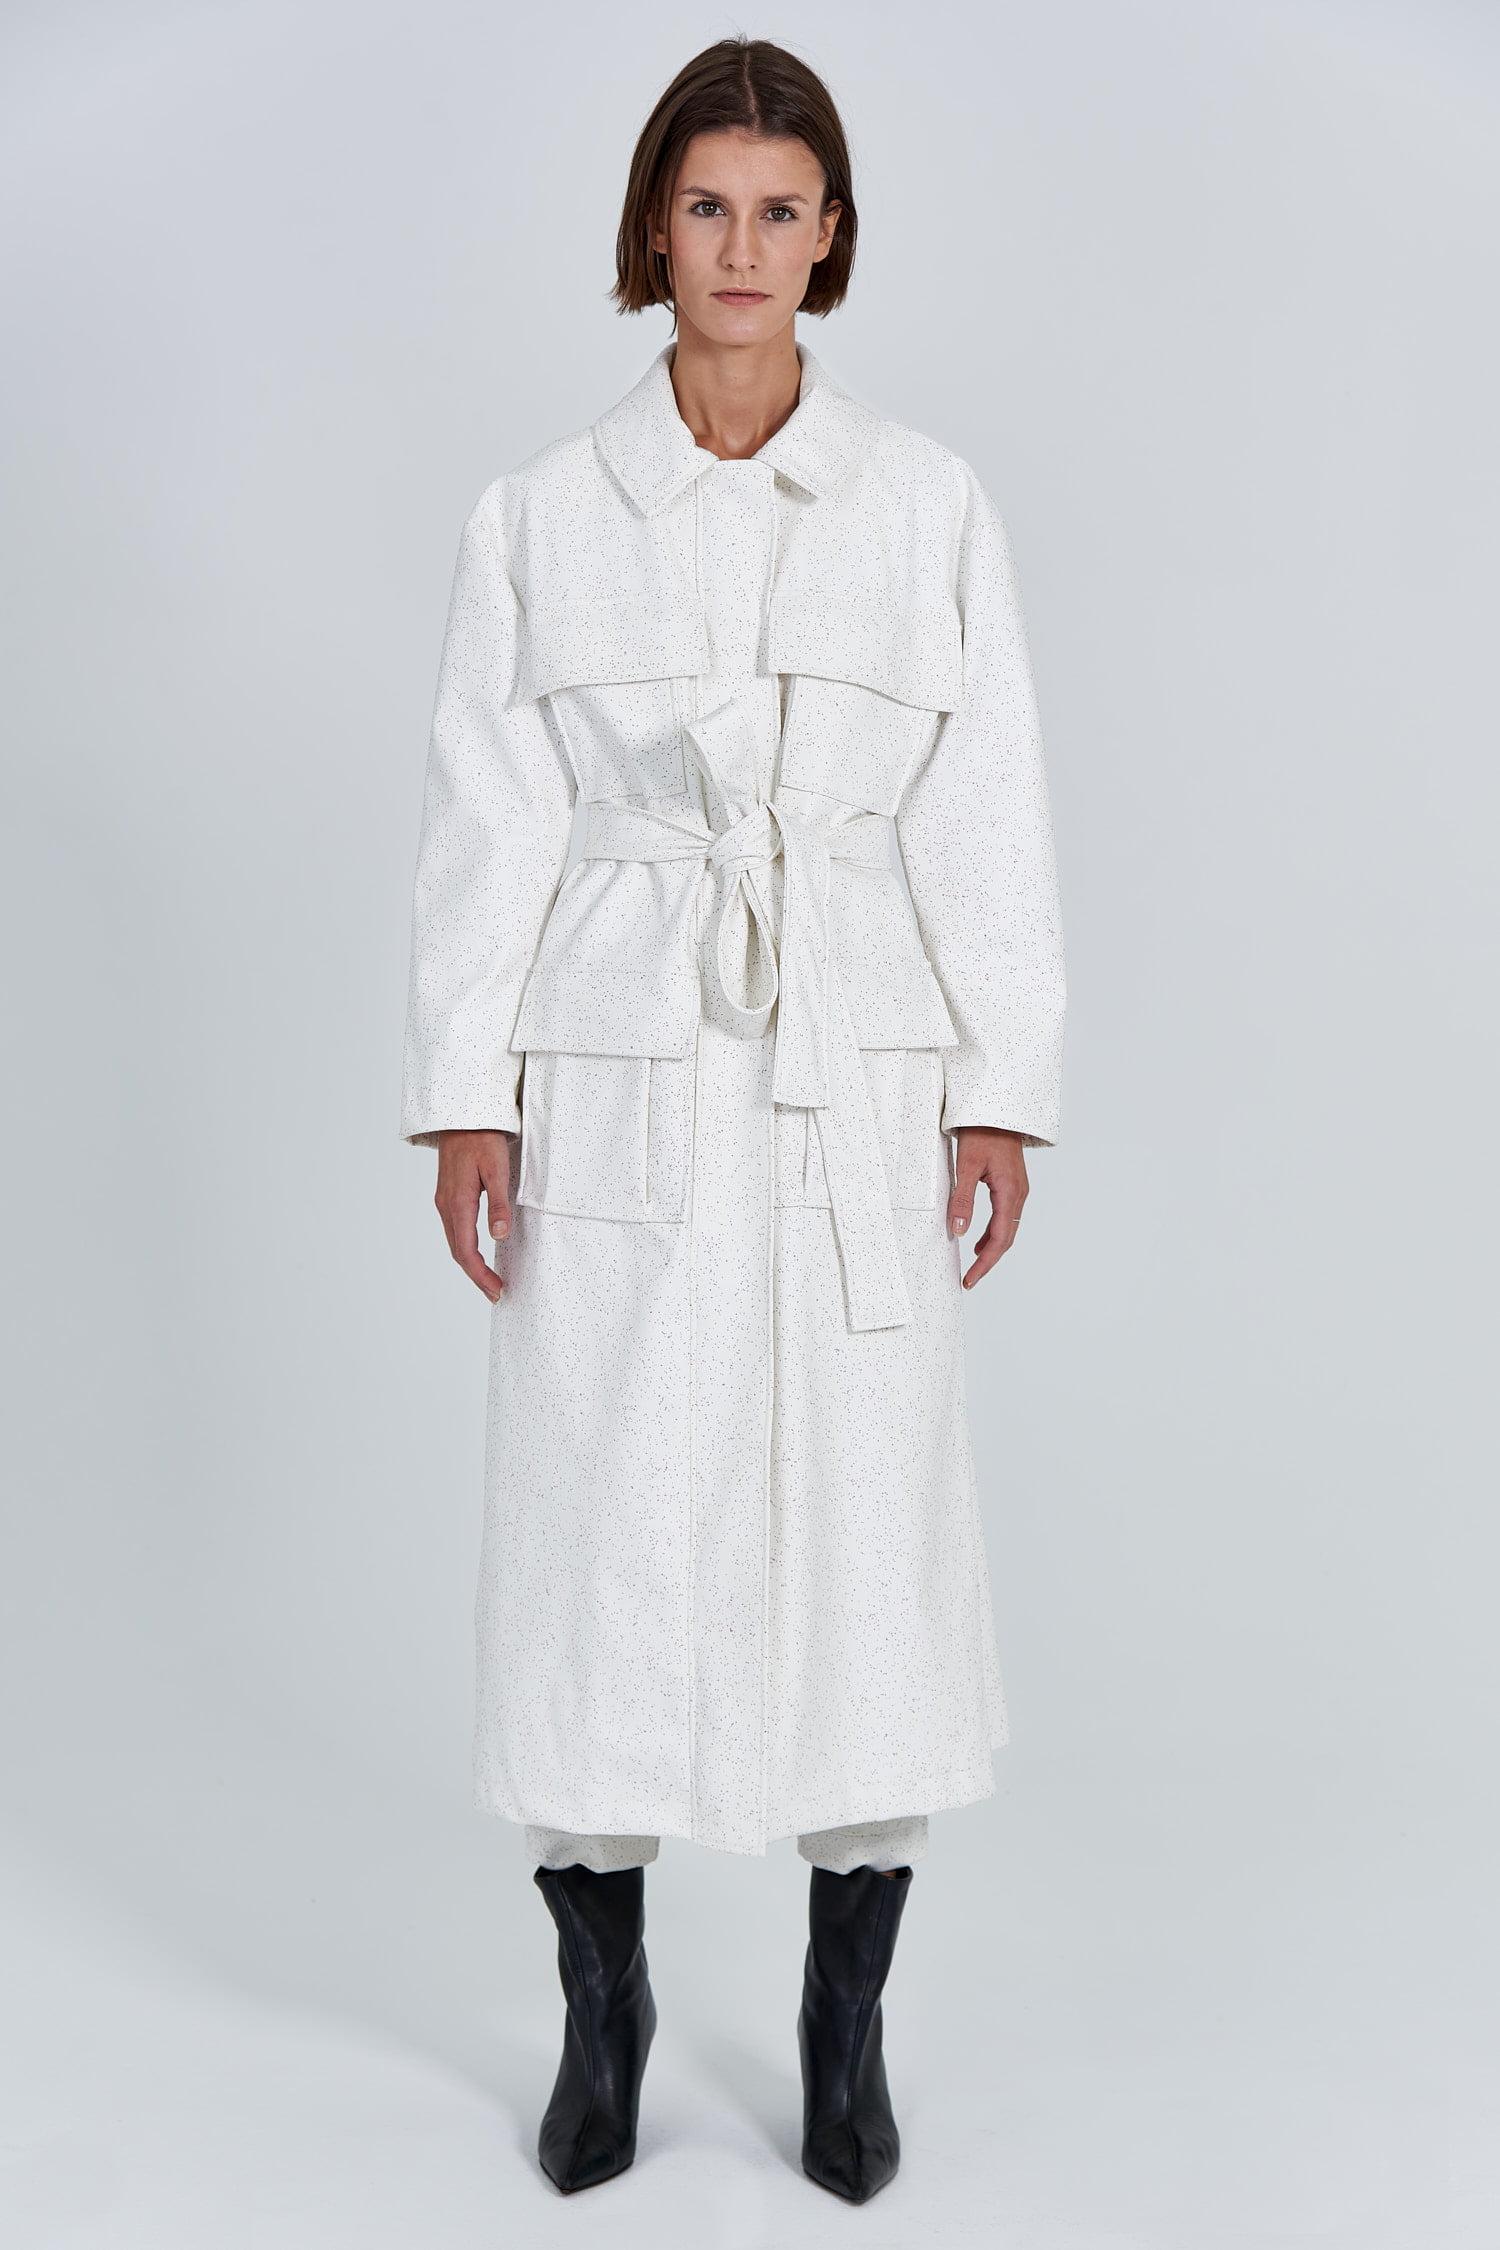 Acephala Fw 2020 21 White Maxi Trench Coat Front